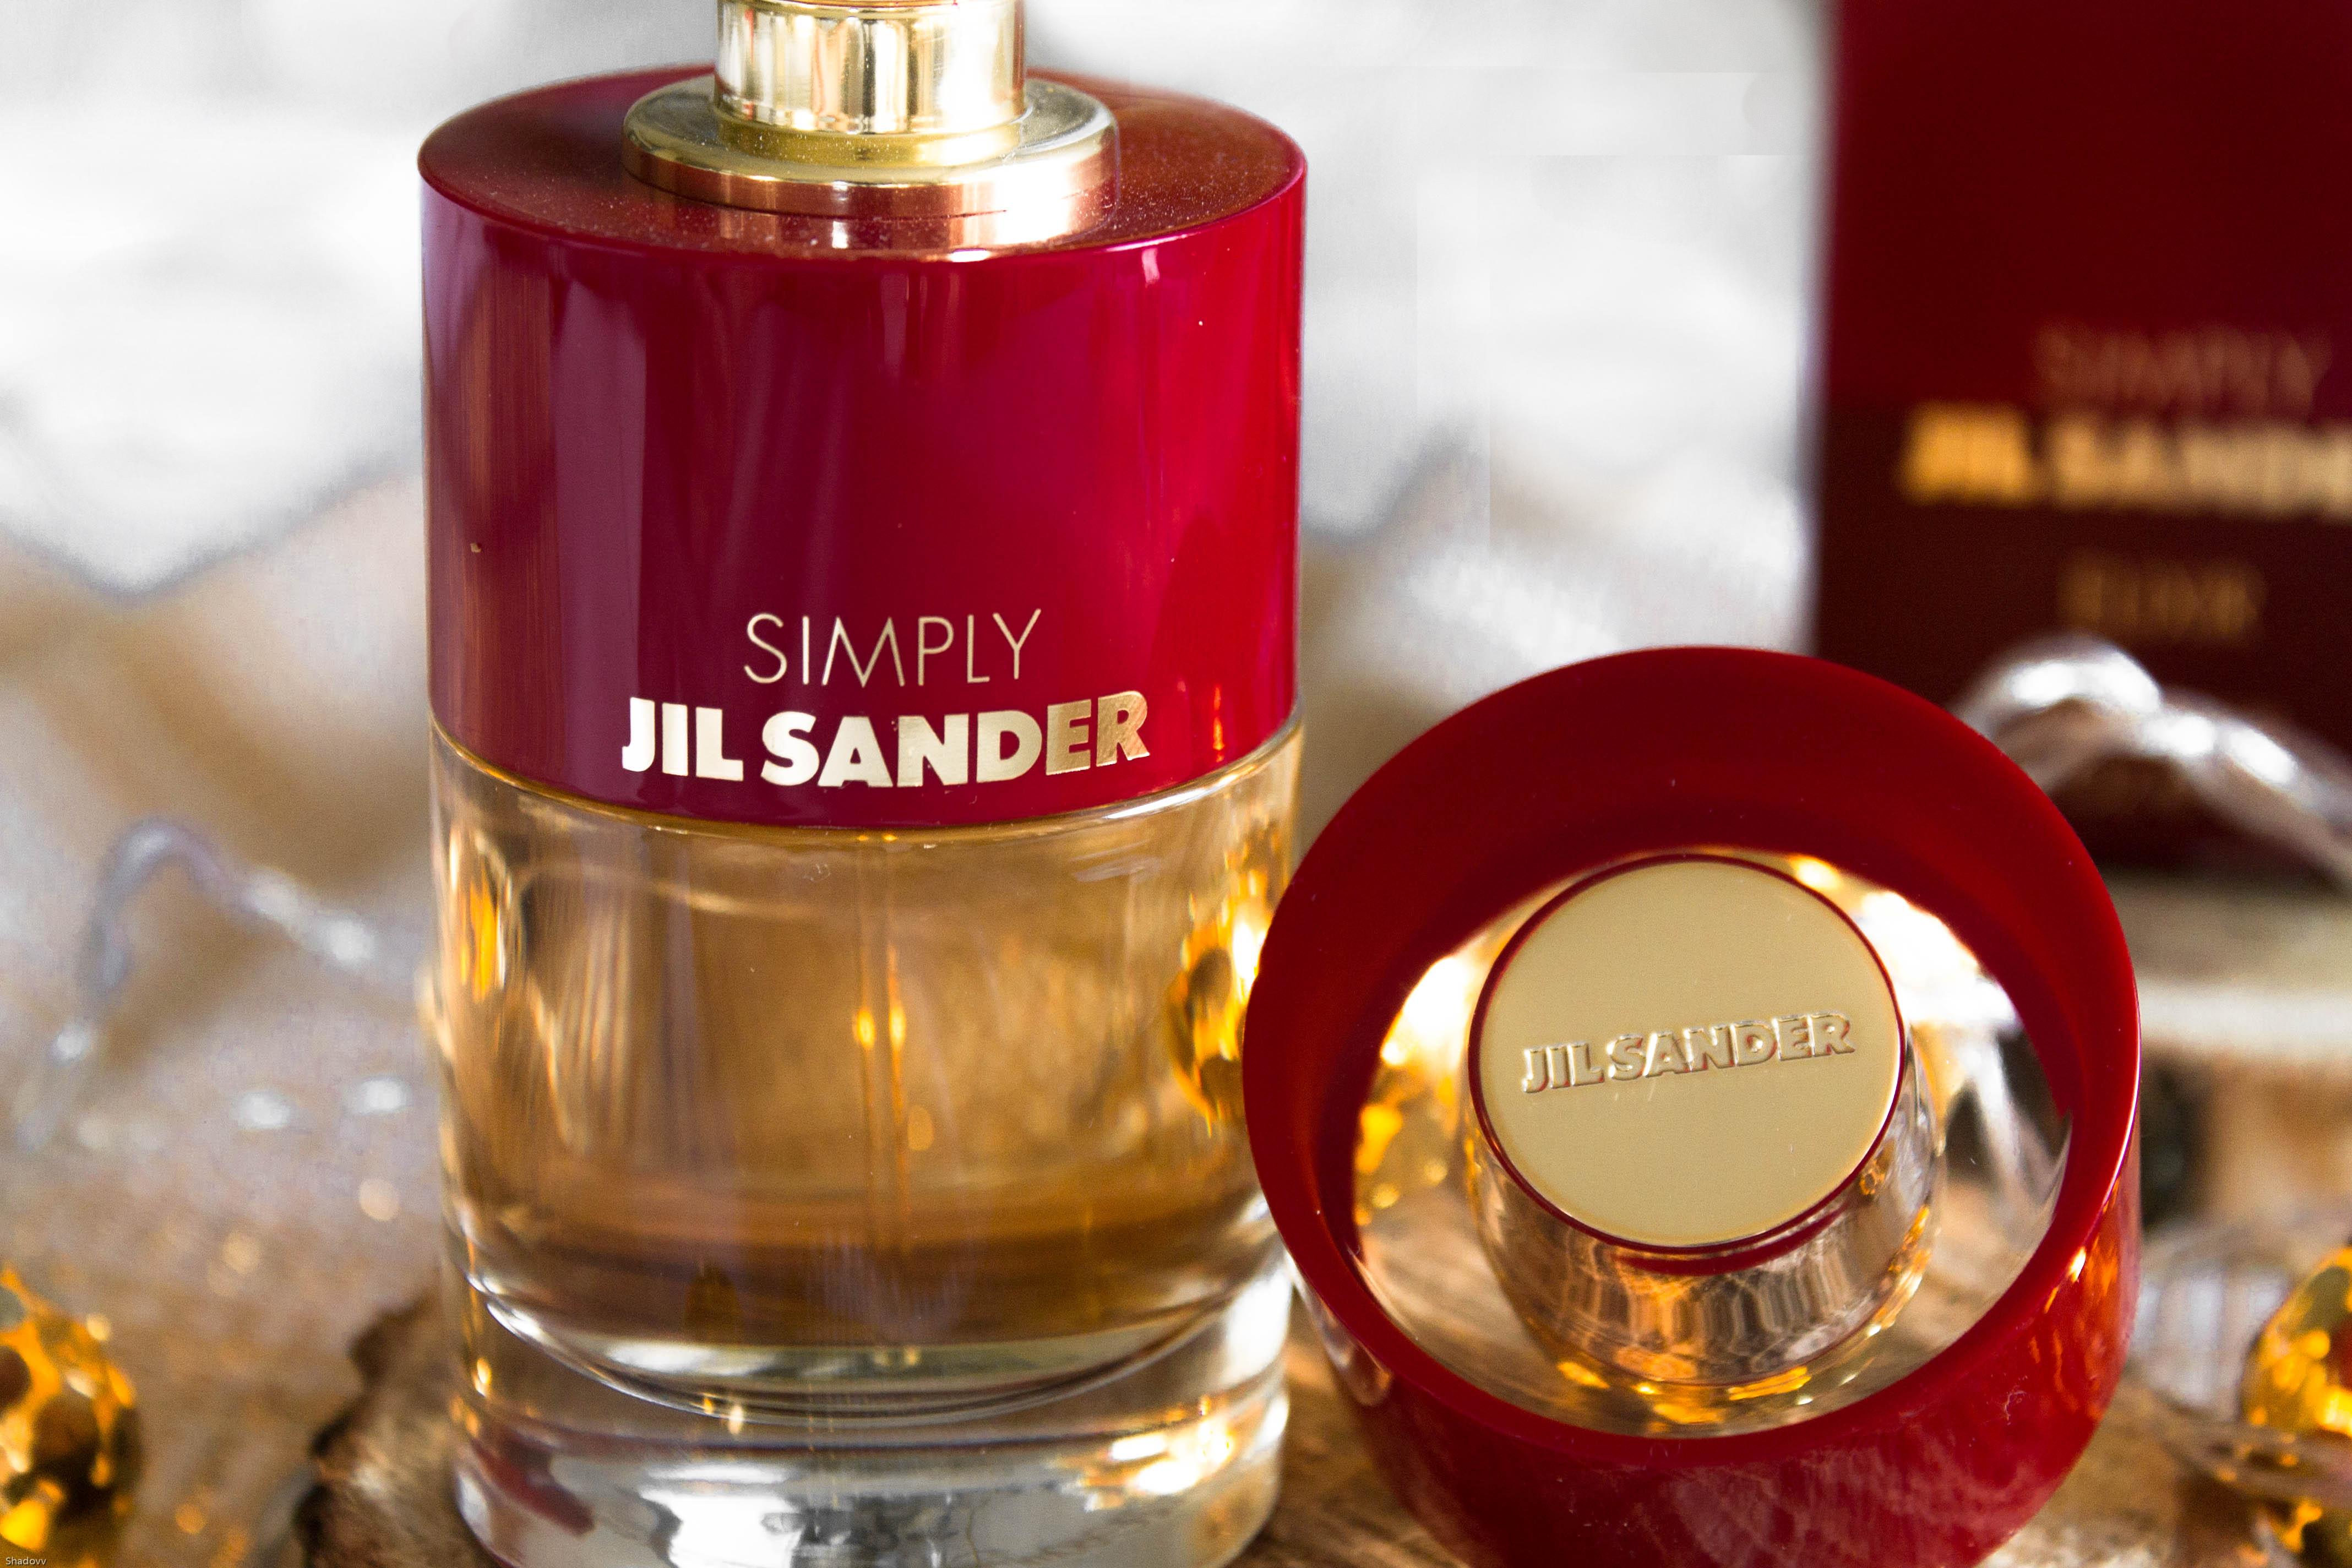 jil sander kardiaserena parfum simply gold red